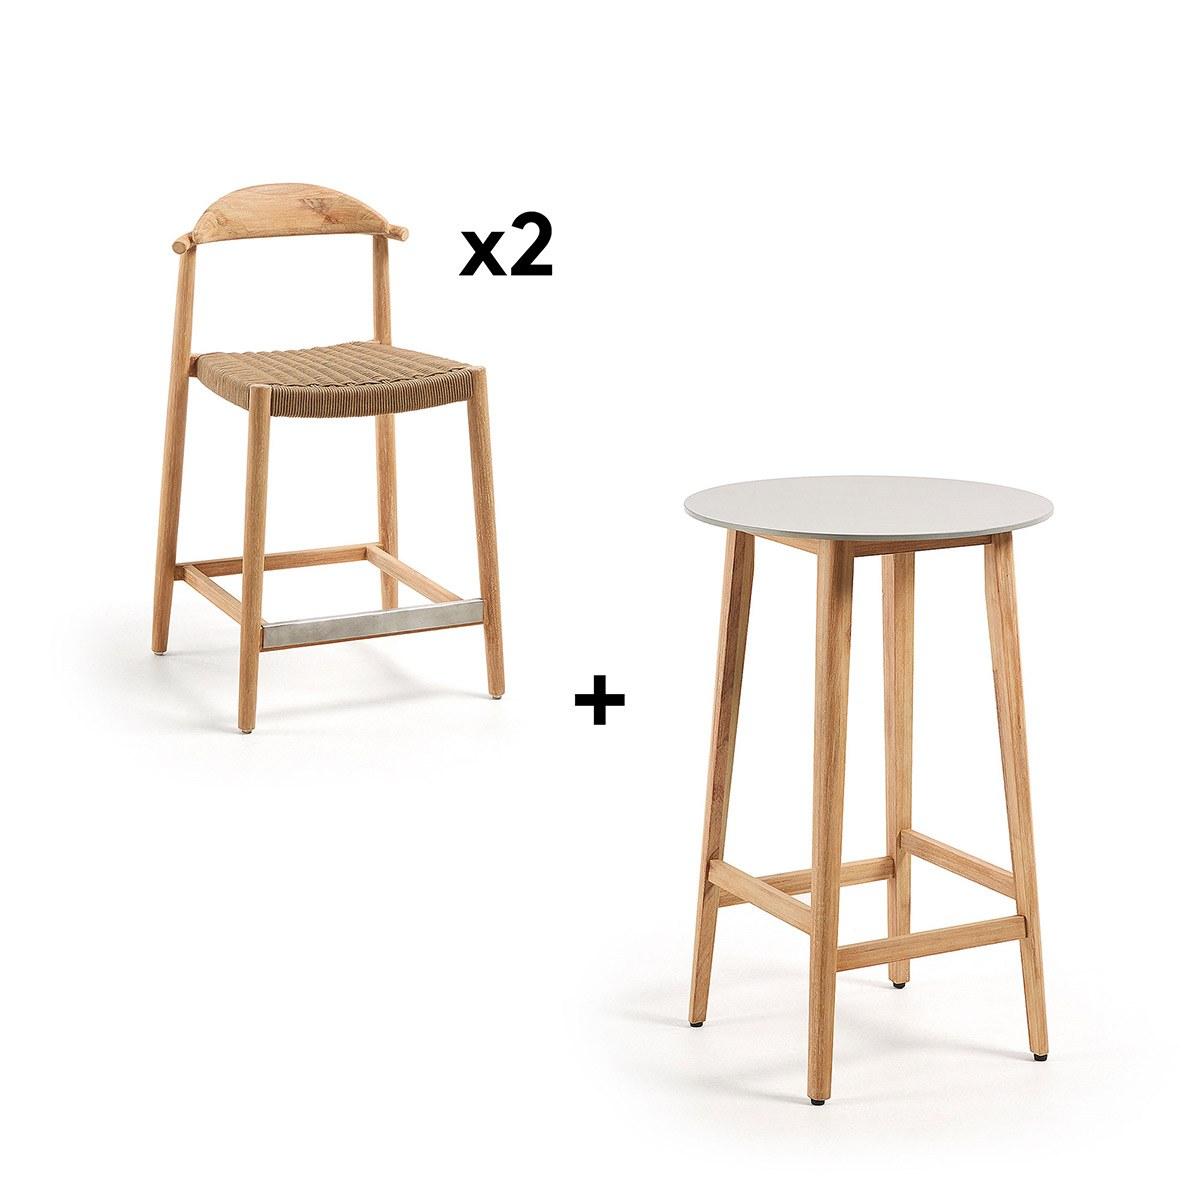 Mesa alta y dos taburetes madera - Artikalia - Packs en OFERTA